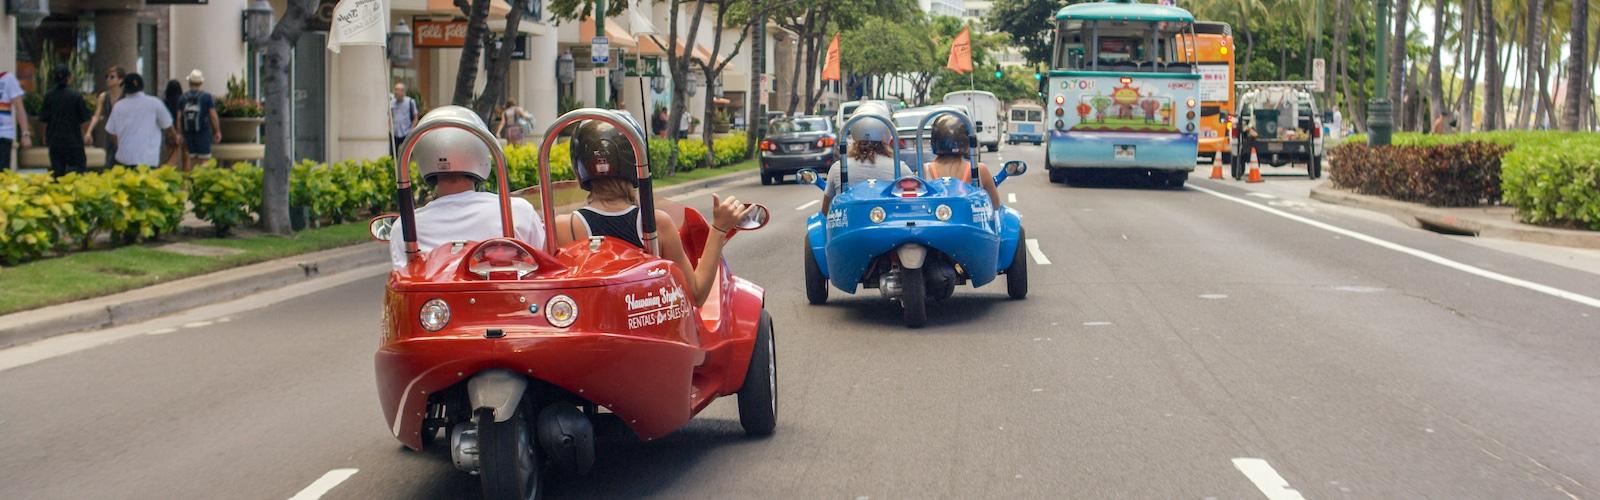 Getting Around Oahu, About Oahu, Waikiki, Honolulu, Hawaii